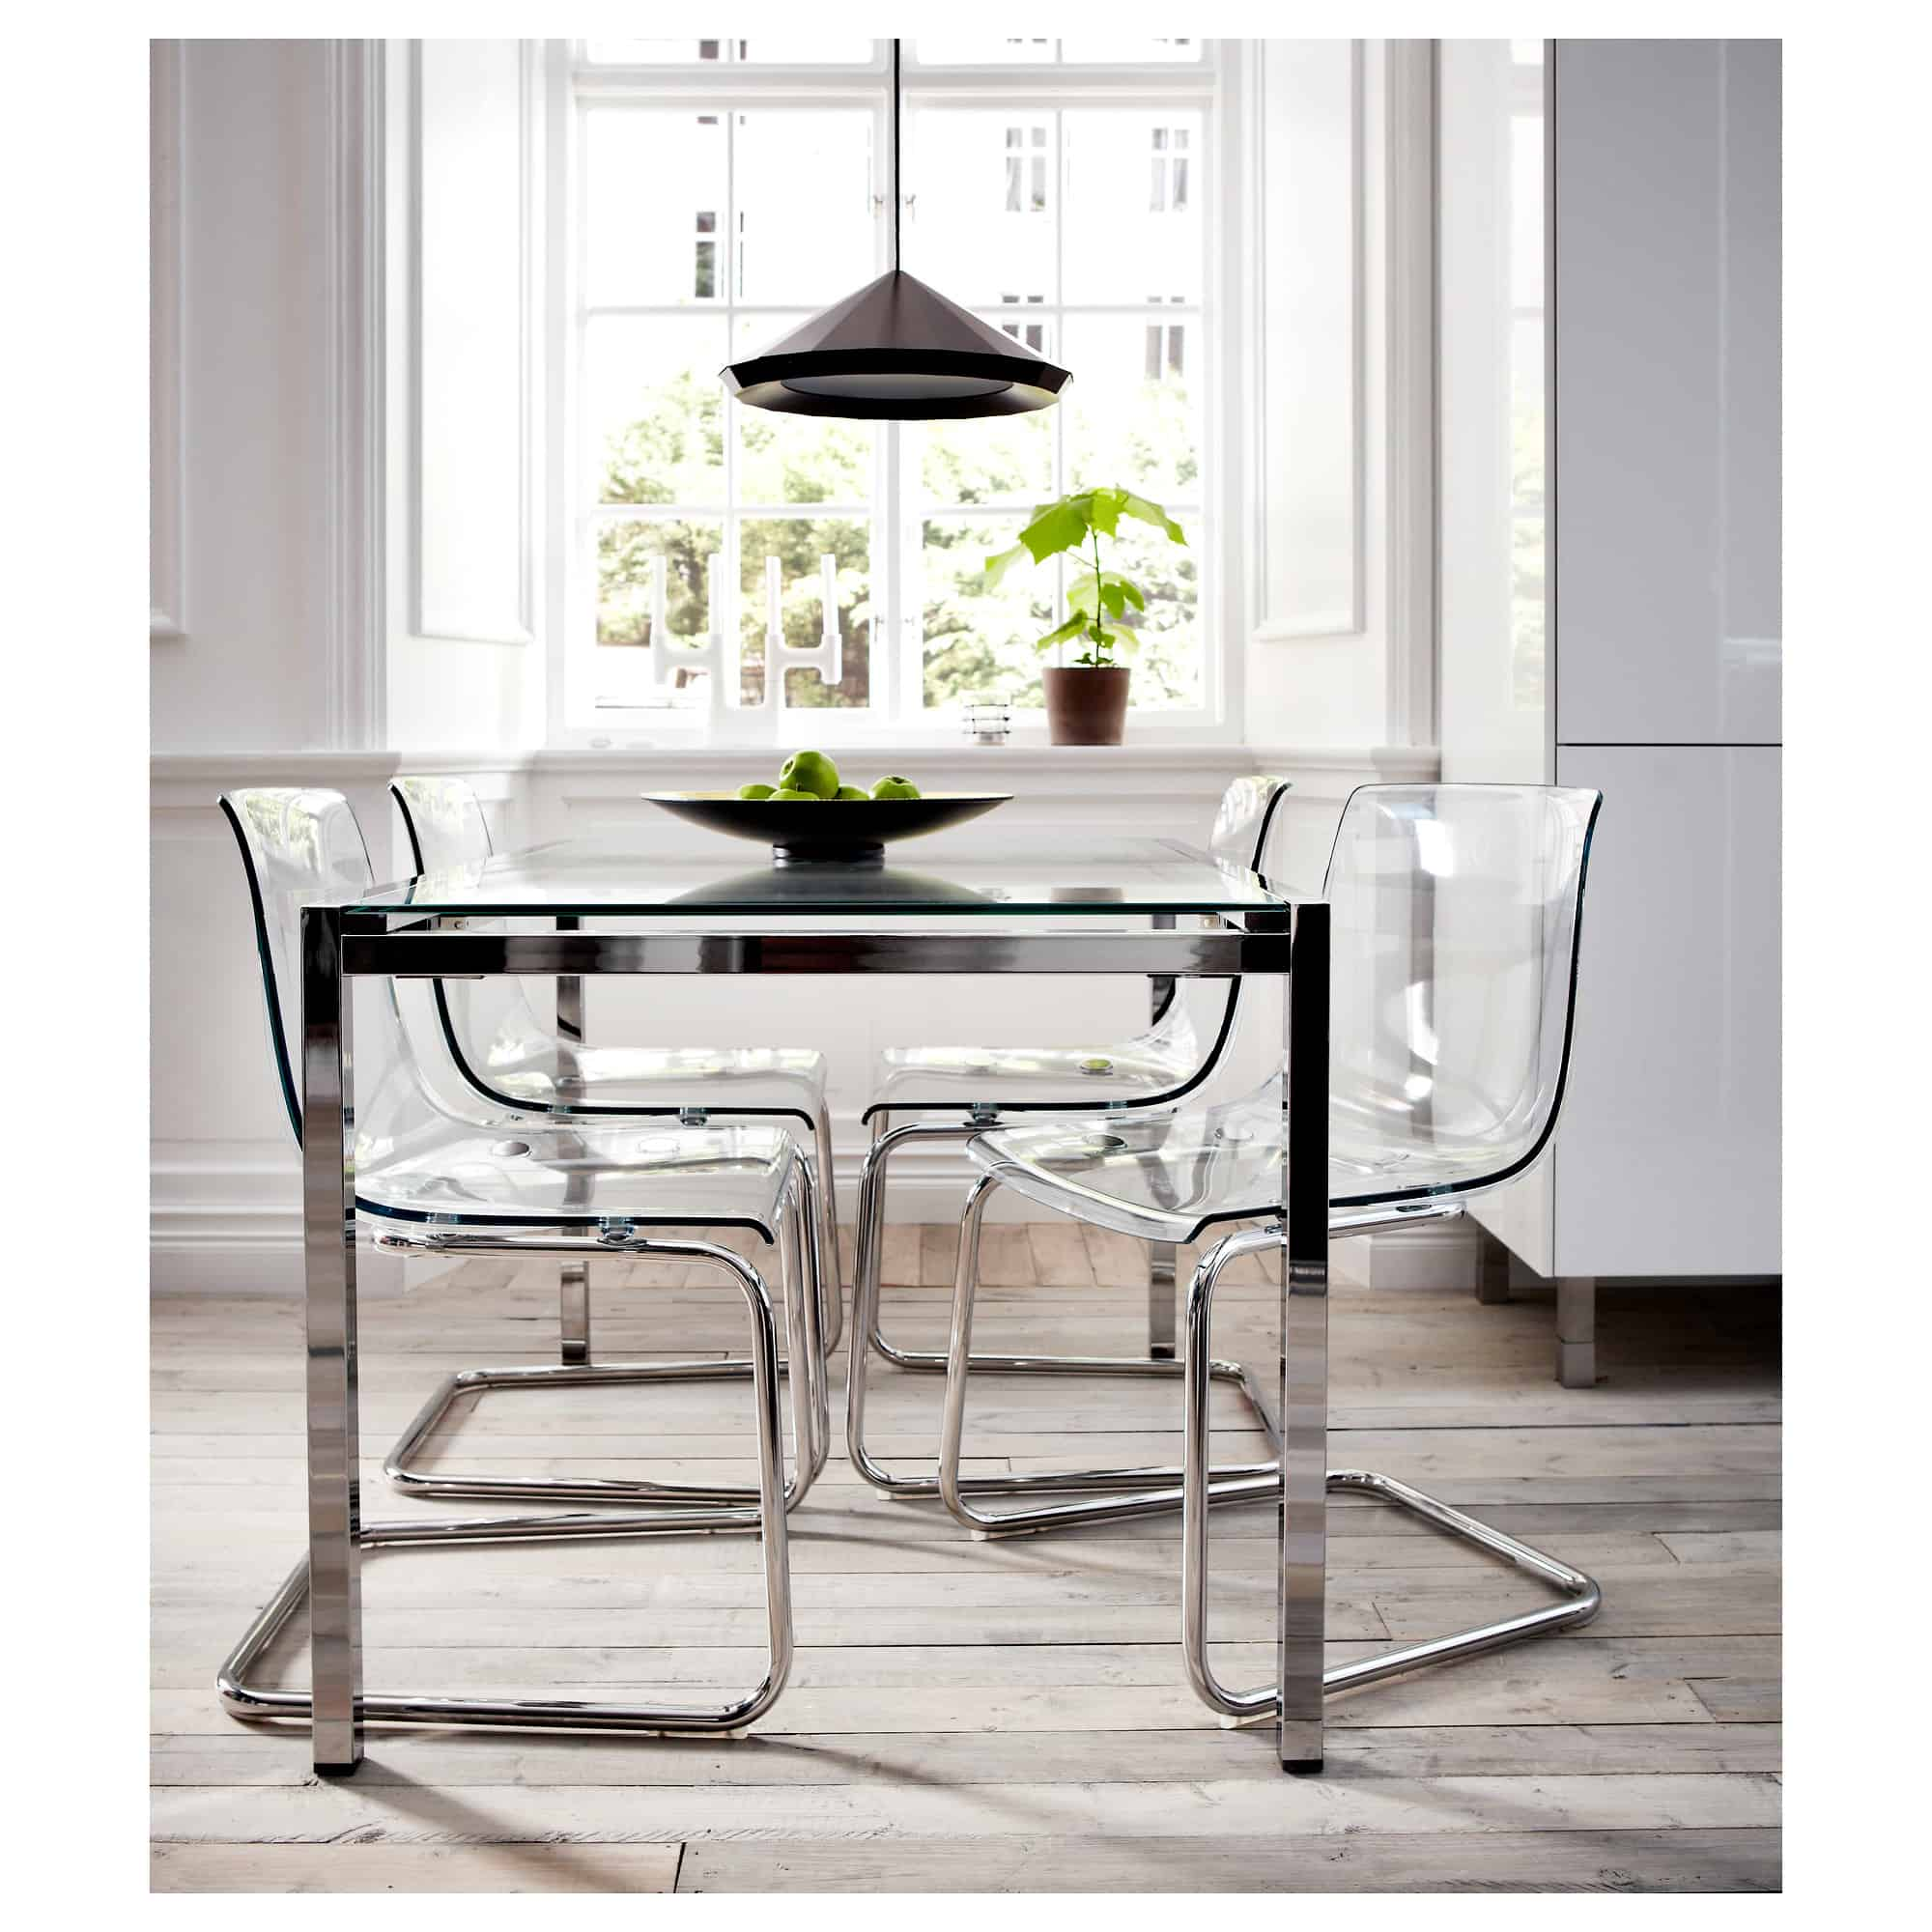 acryilic and metal modern chairs